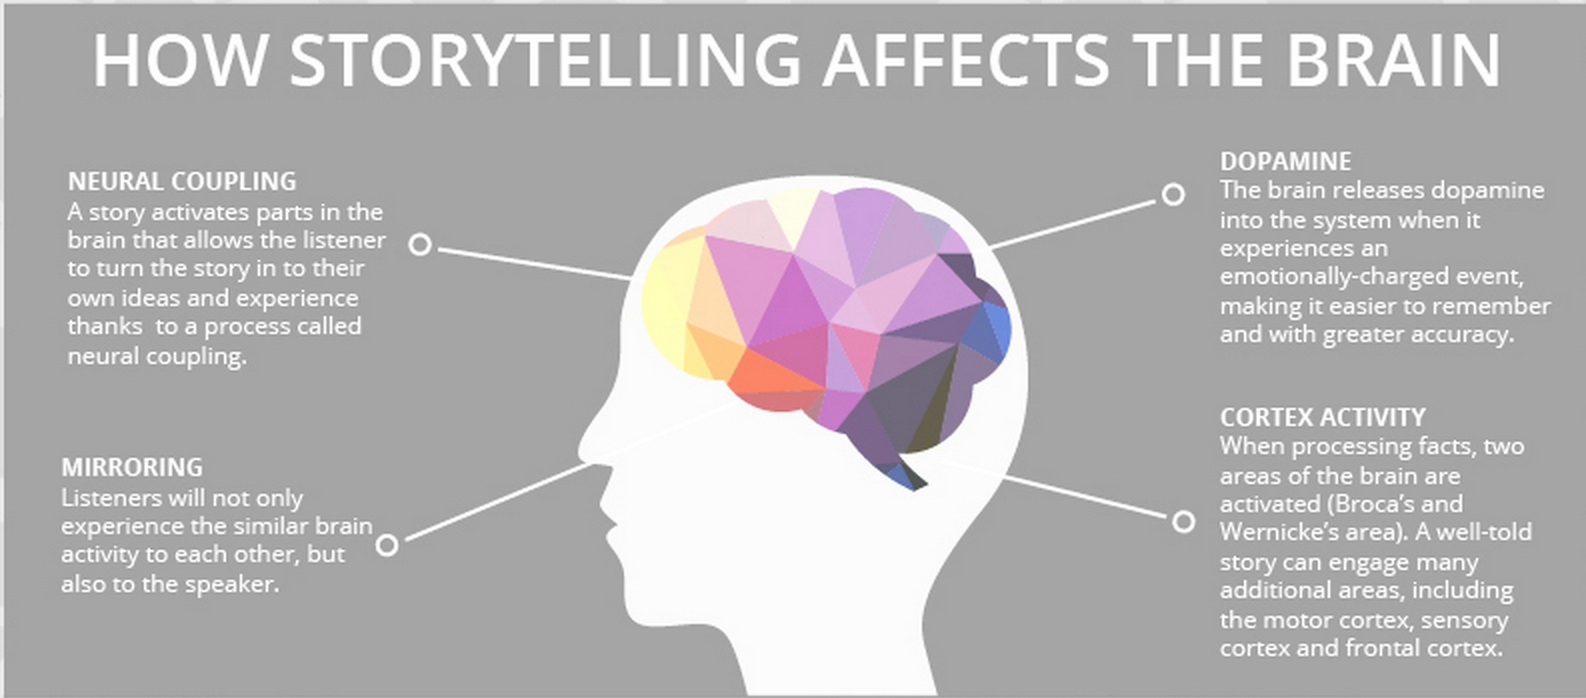 social-media-storytelling-effects